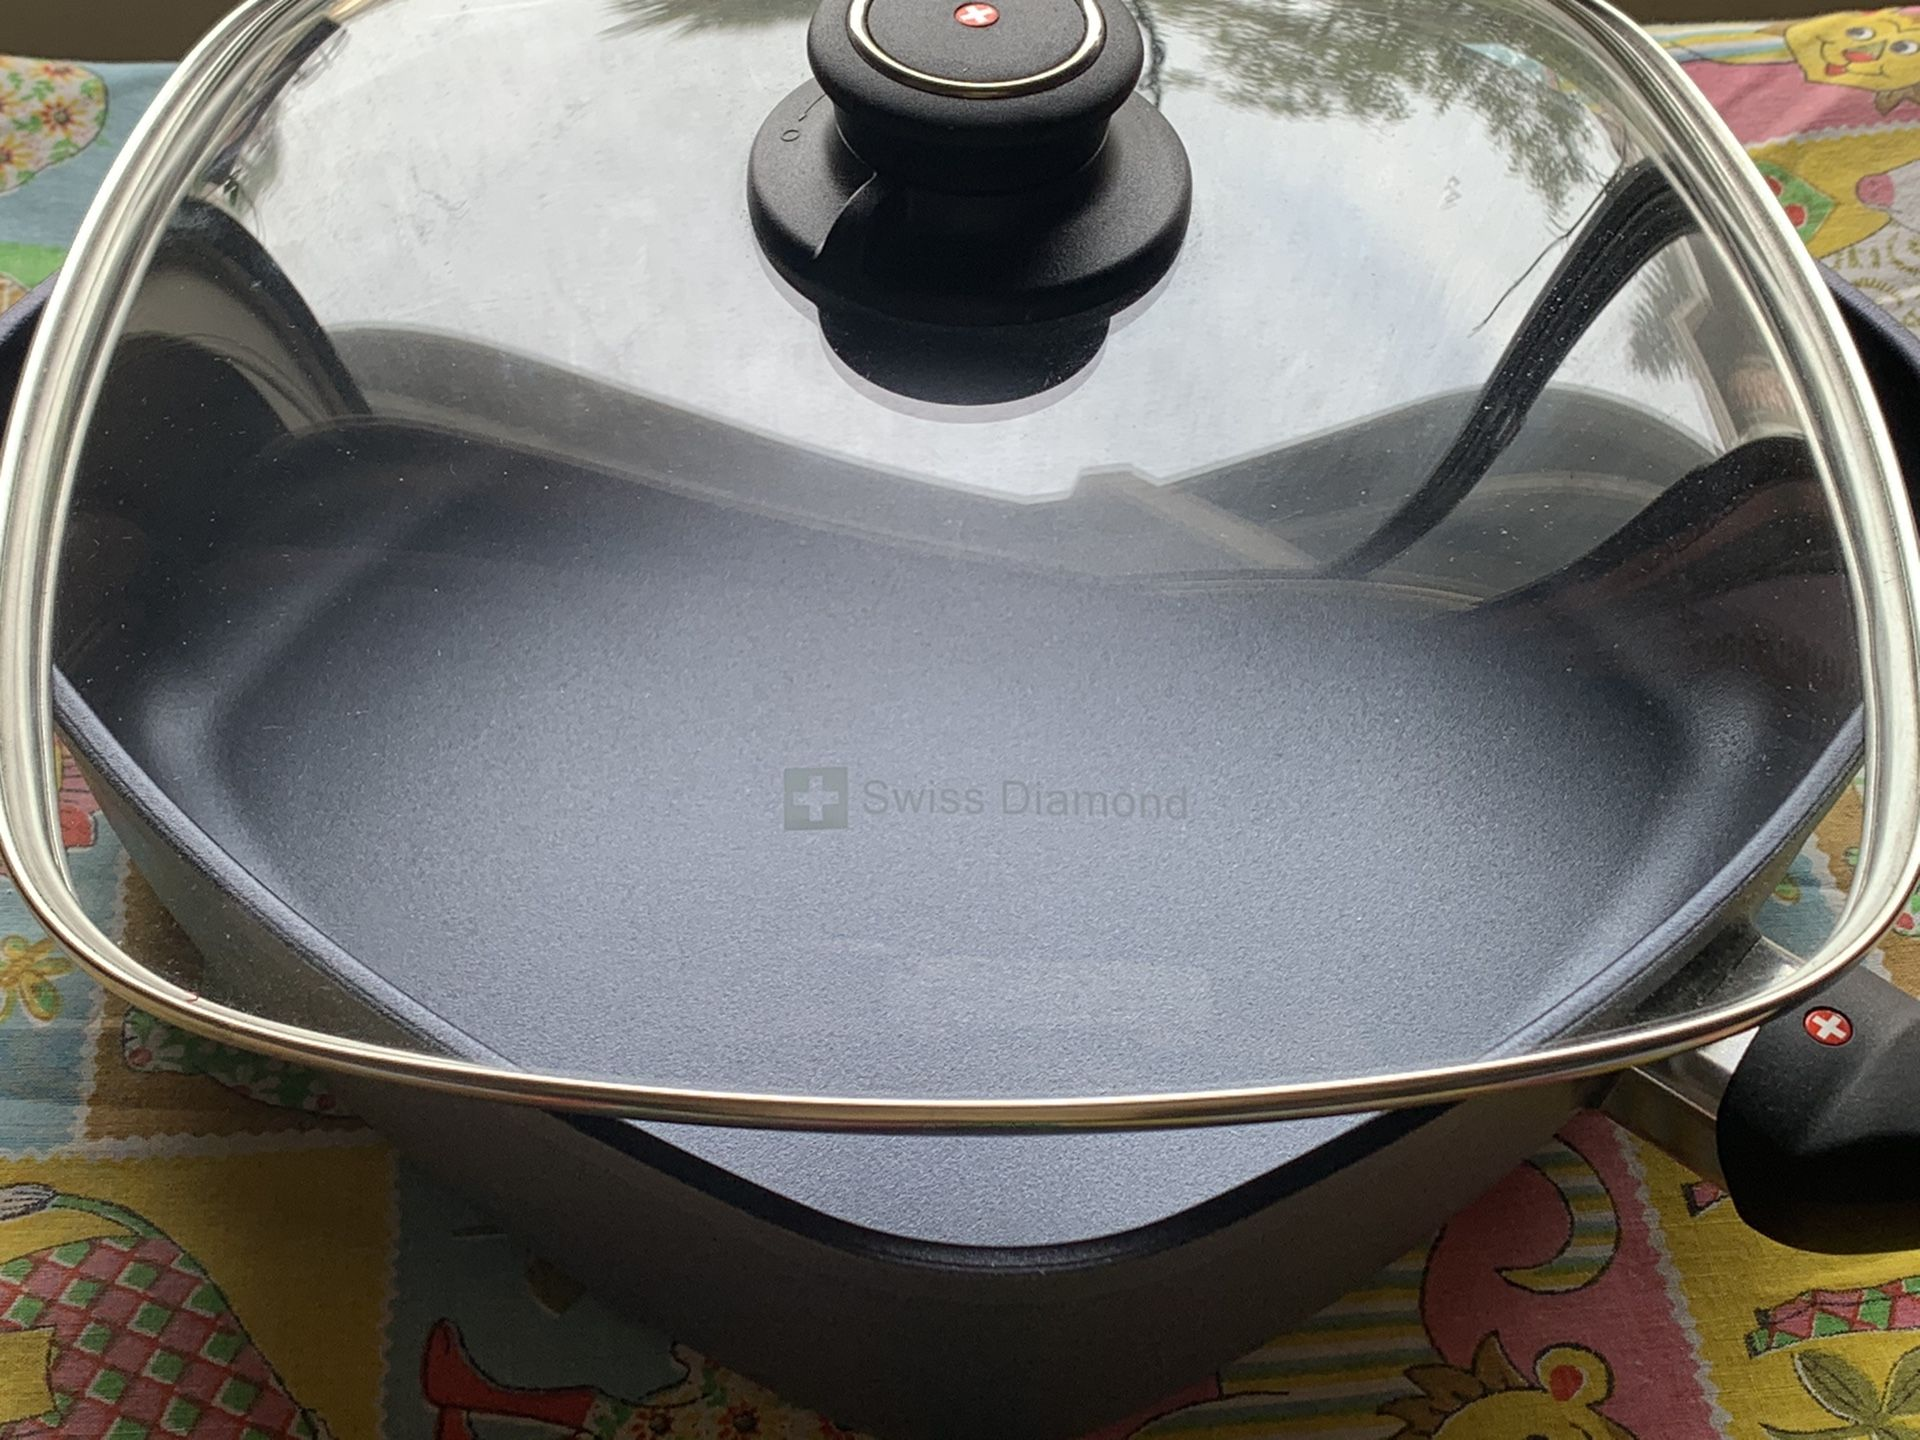 Swiss Diamond 2 1/2 Qt Fry Pan